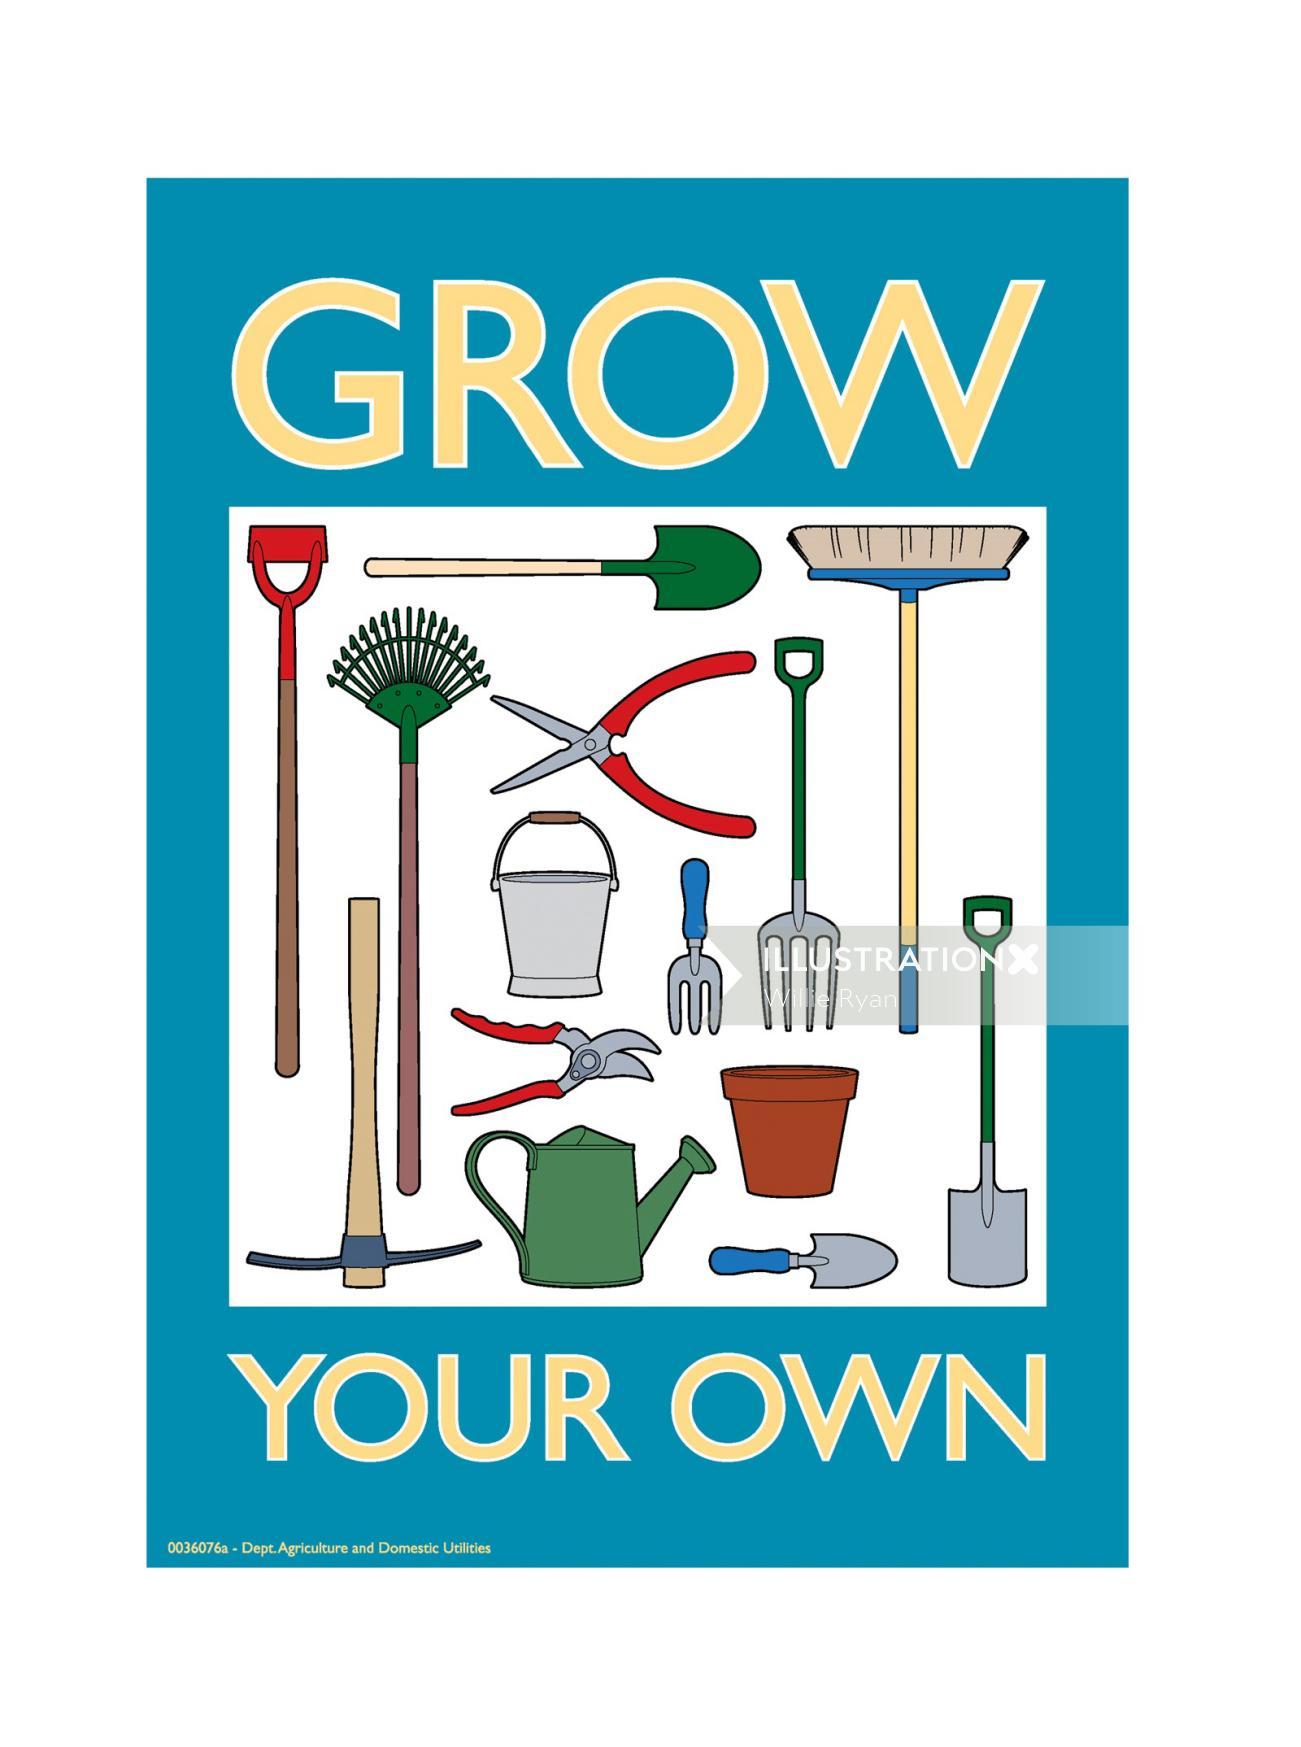 Gardening tools illustration by Willie Ryan